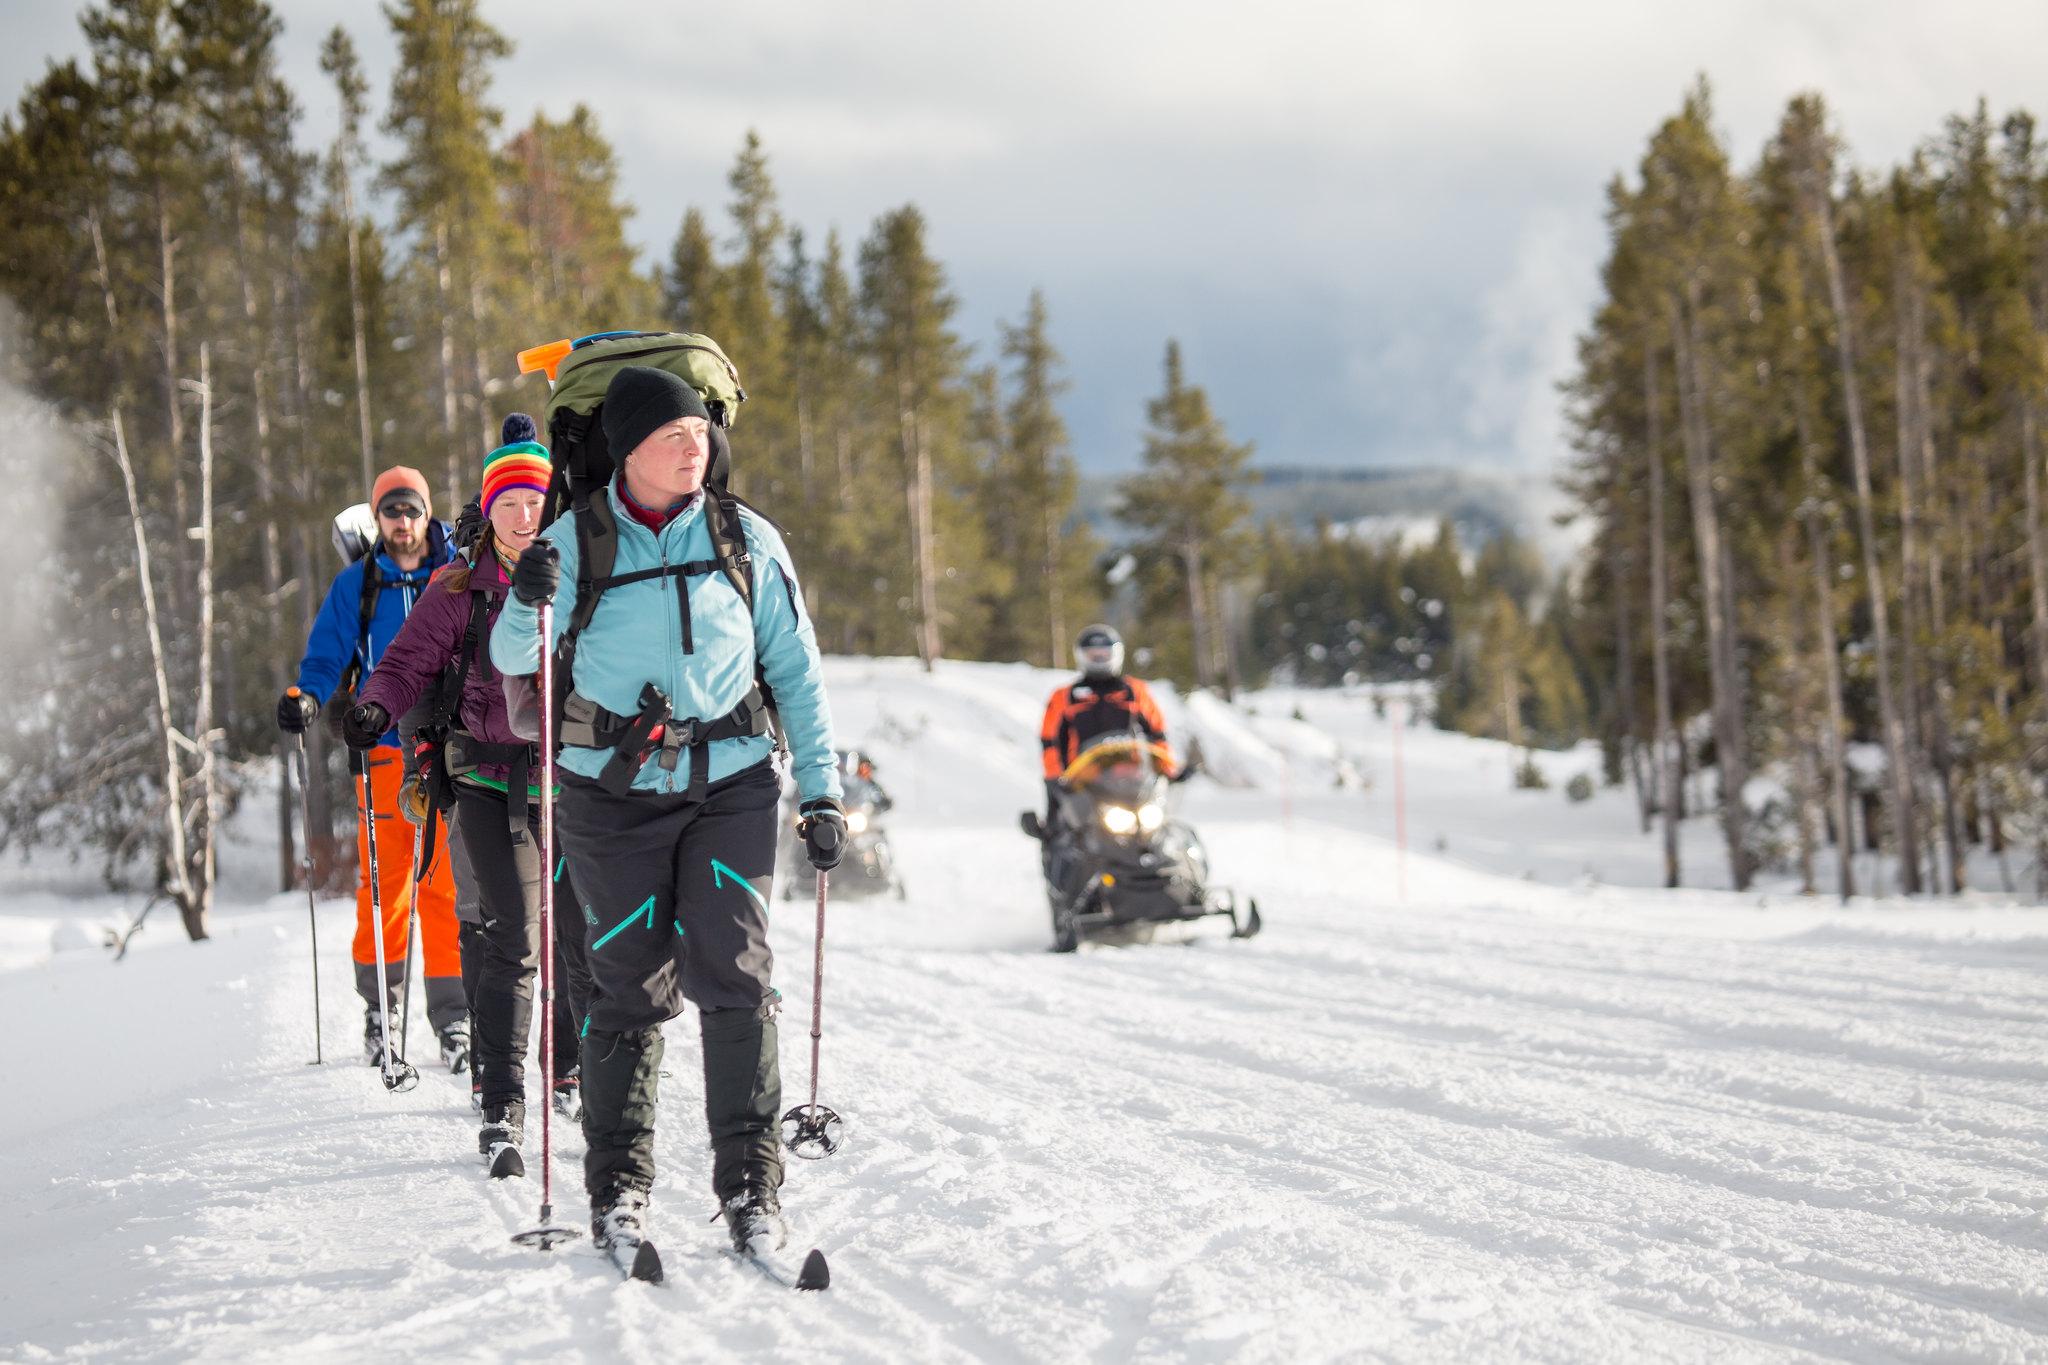 Yellowstone's winter season starts December 15, 2019 - Yellowstone National Park (U.S. National Park Service)